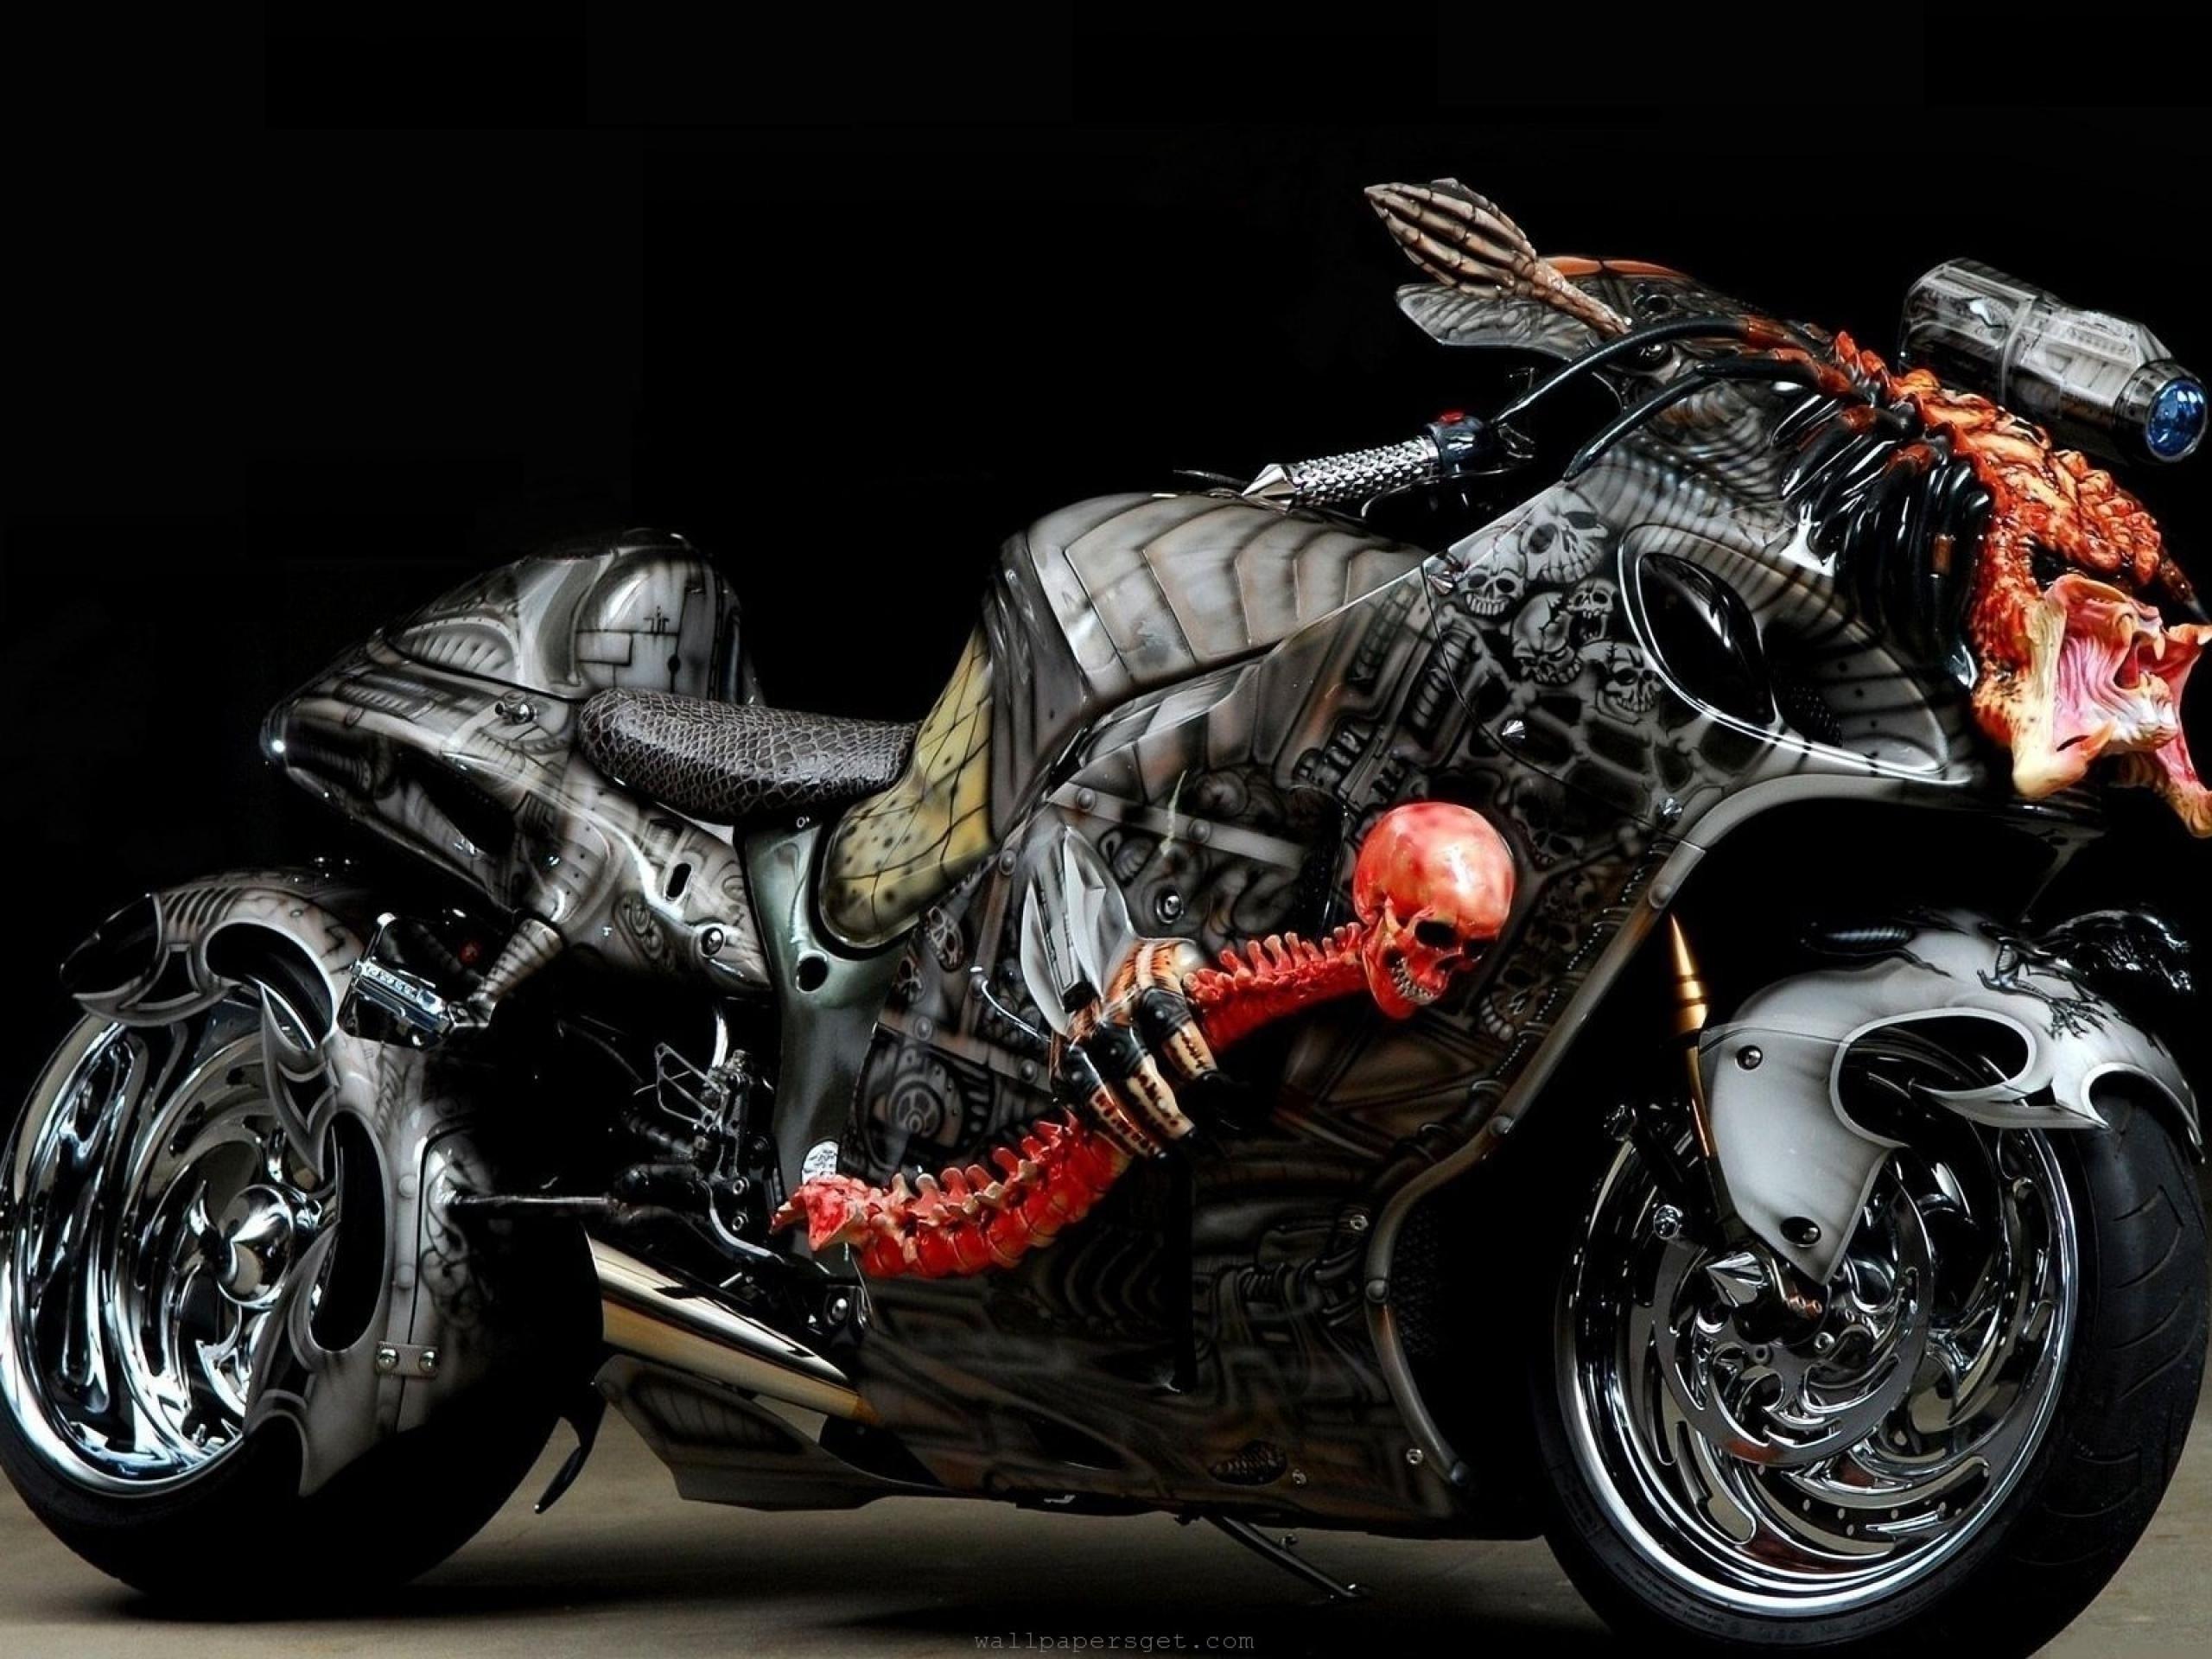 Crazy suzuki hayabusa tuning motorbikes 2560 1920 wallpaper Vehicles  Motorcycles HD skull wheels chrome skeleton dark scary colors stance custom  wallpaper …